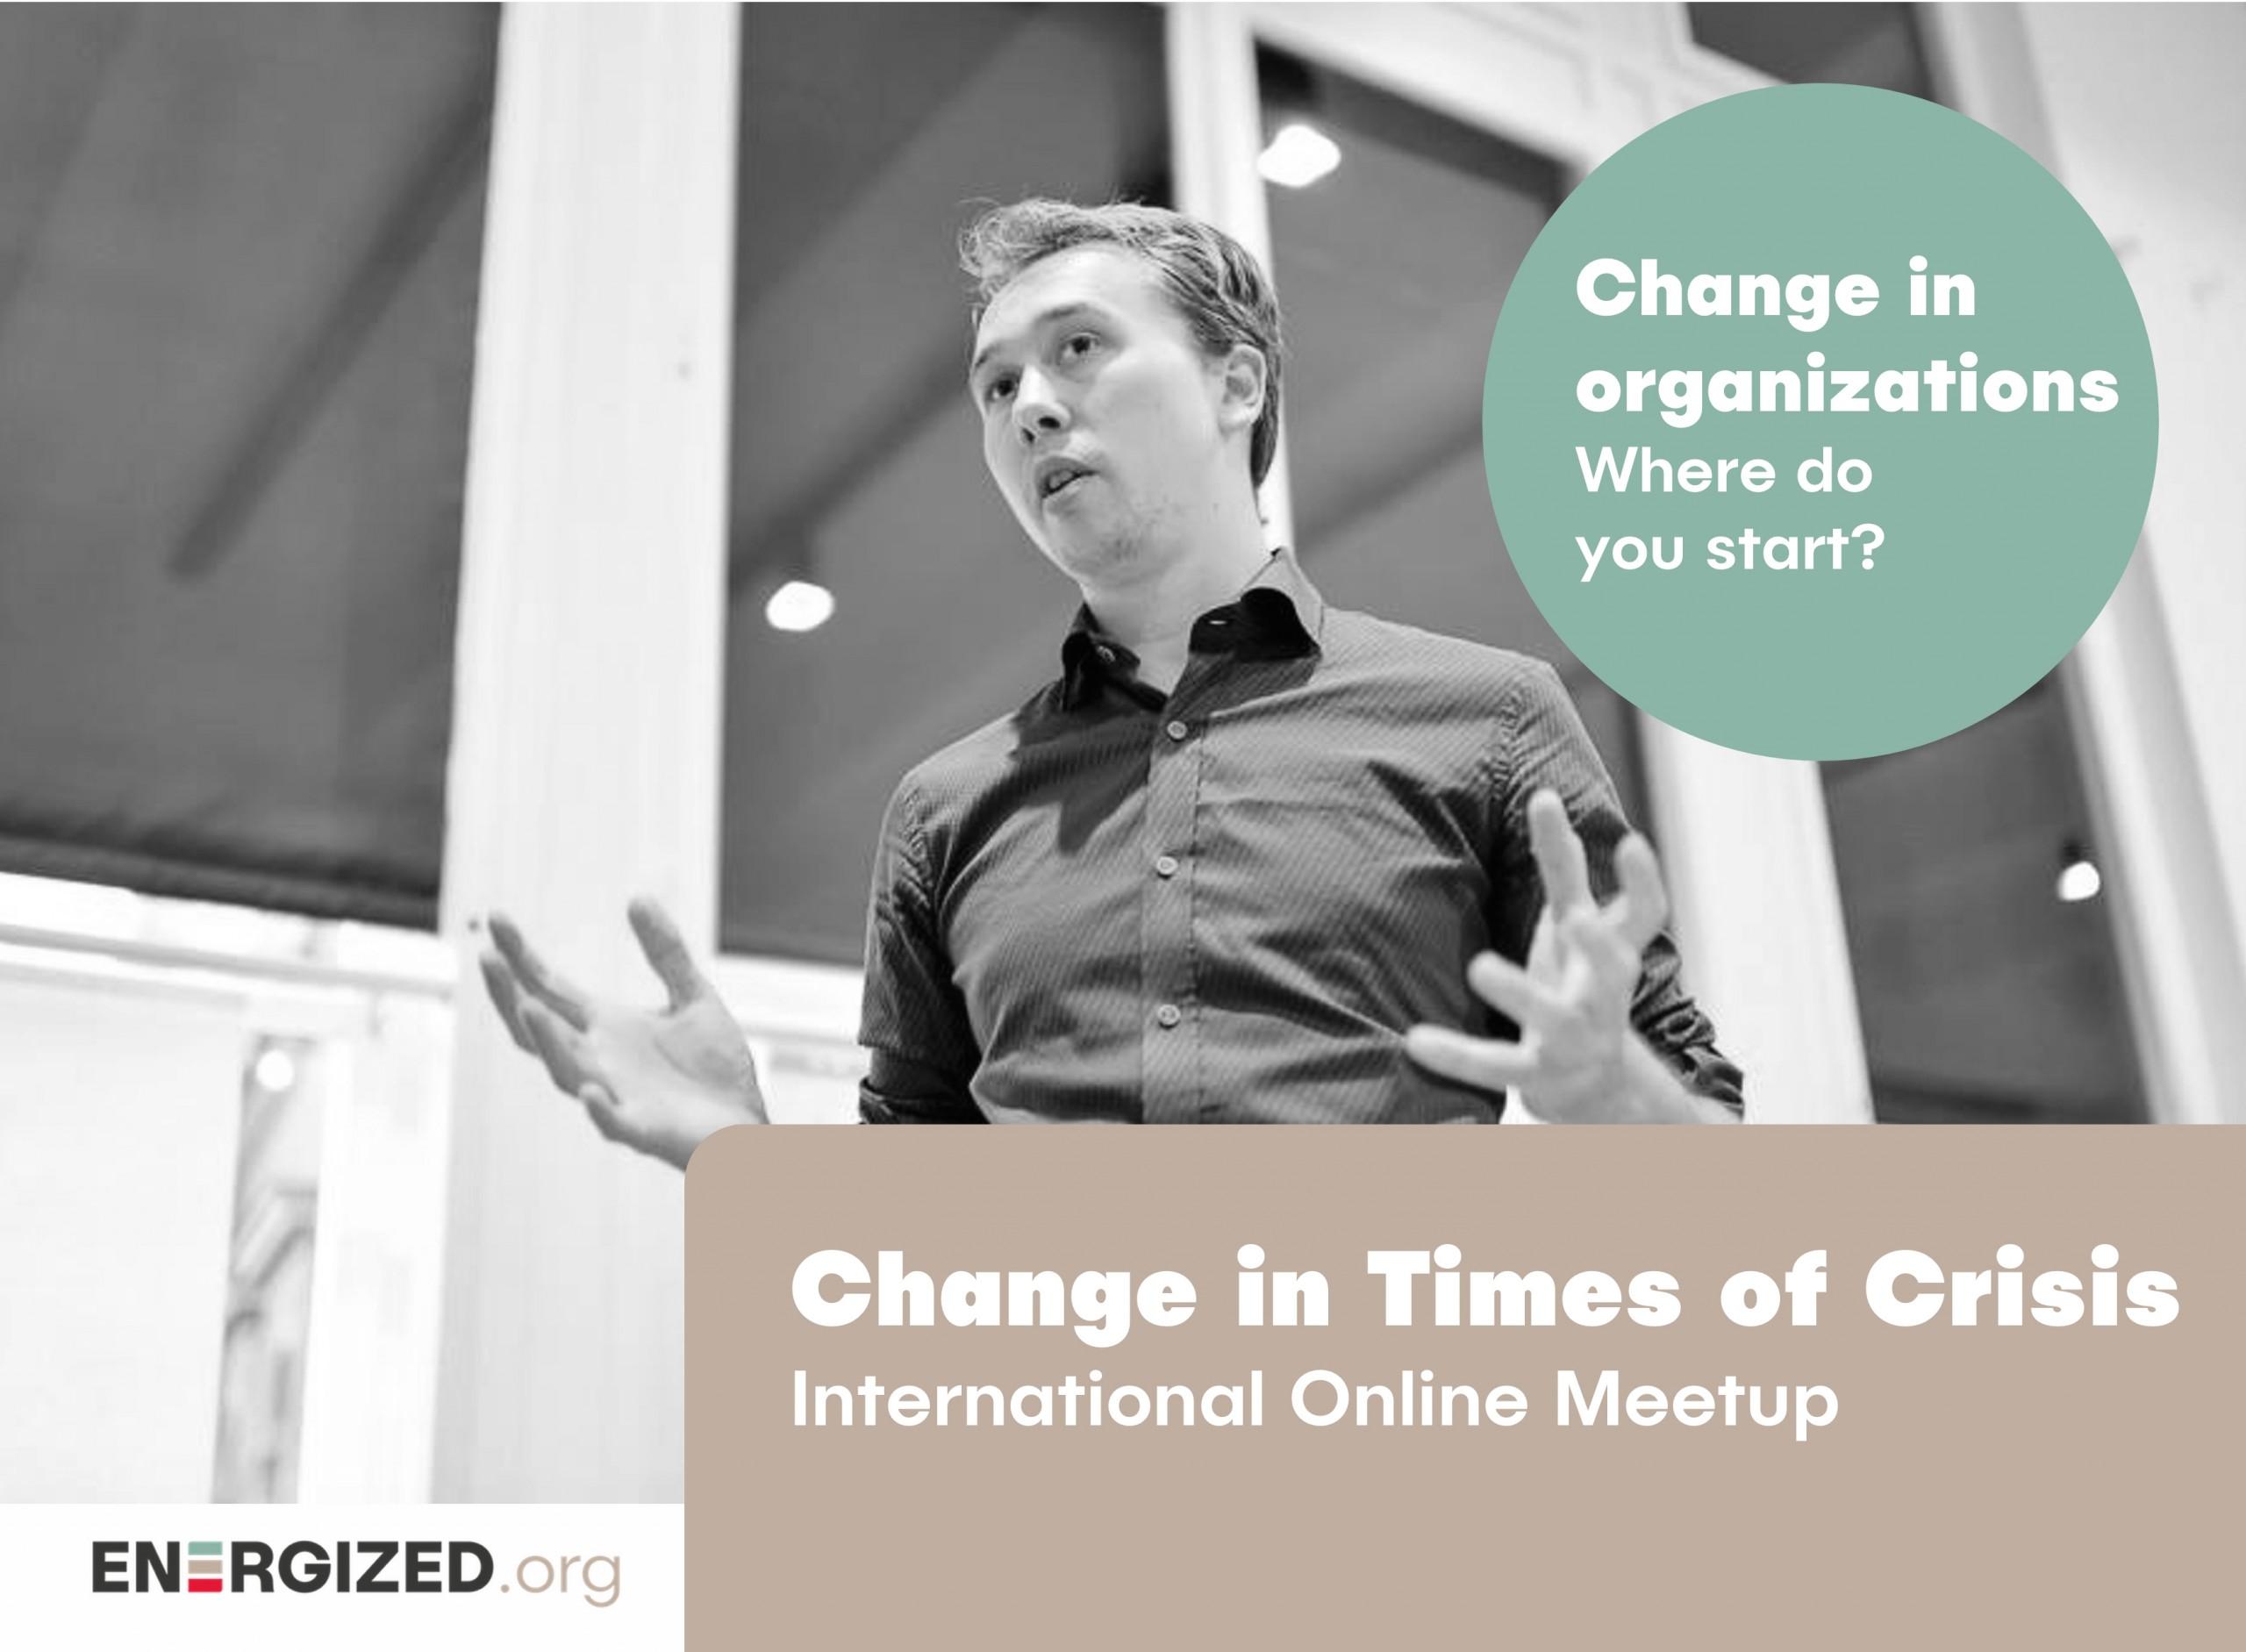 change in organizations online meetup